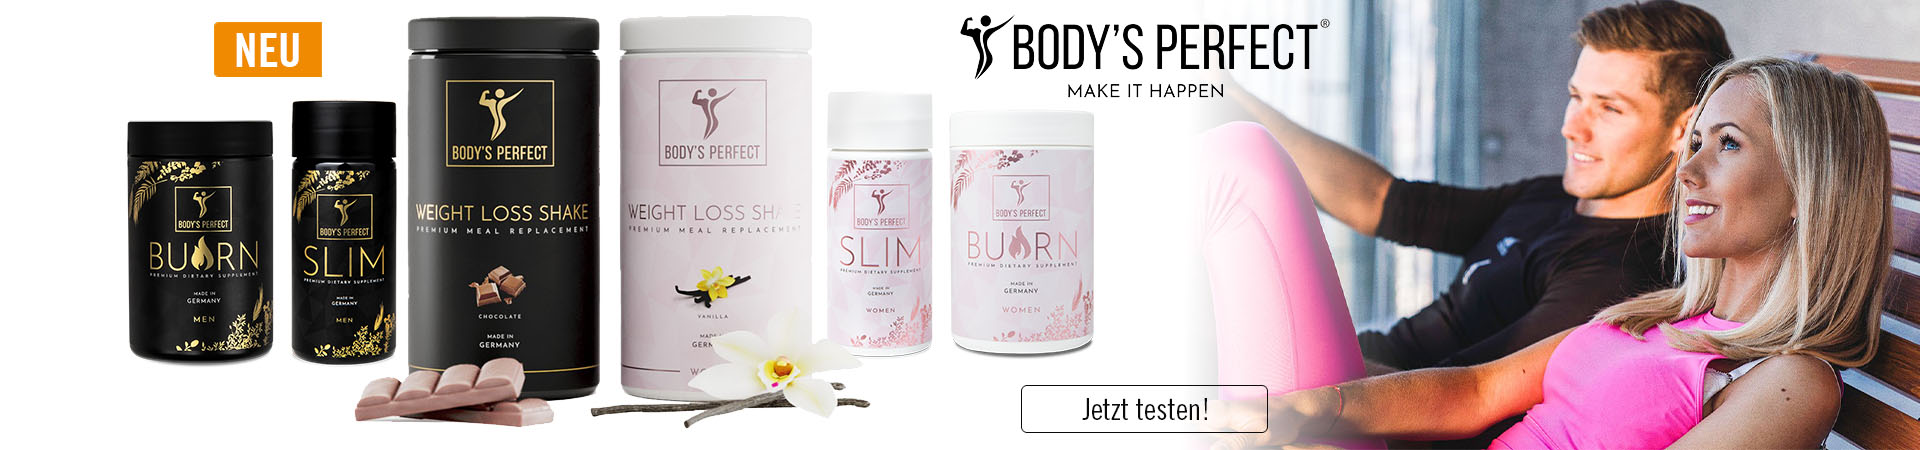 Bodys Perfect